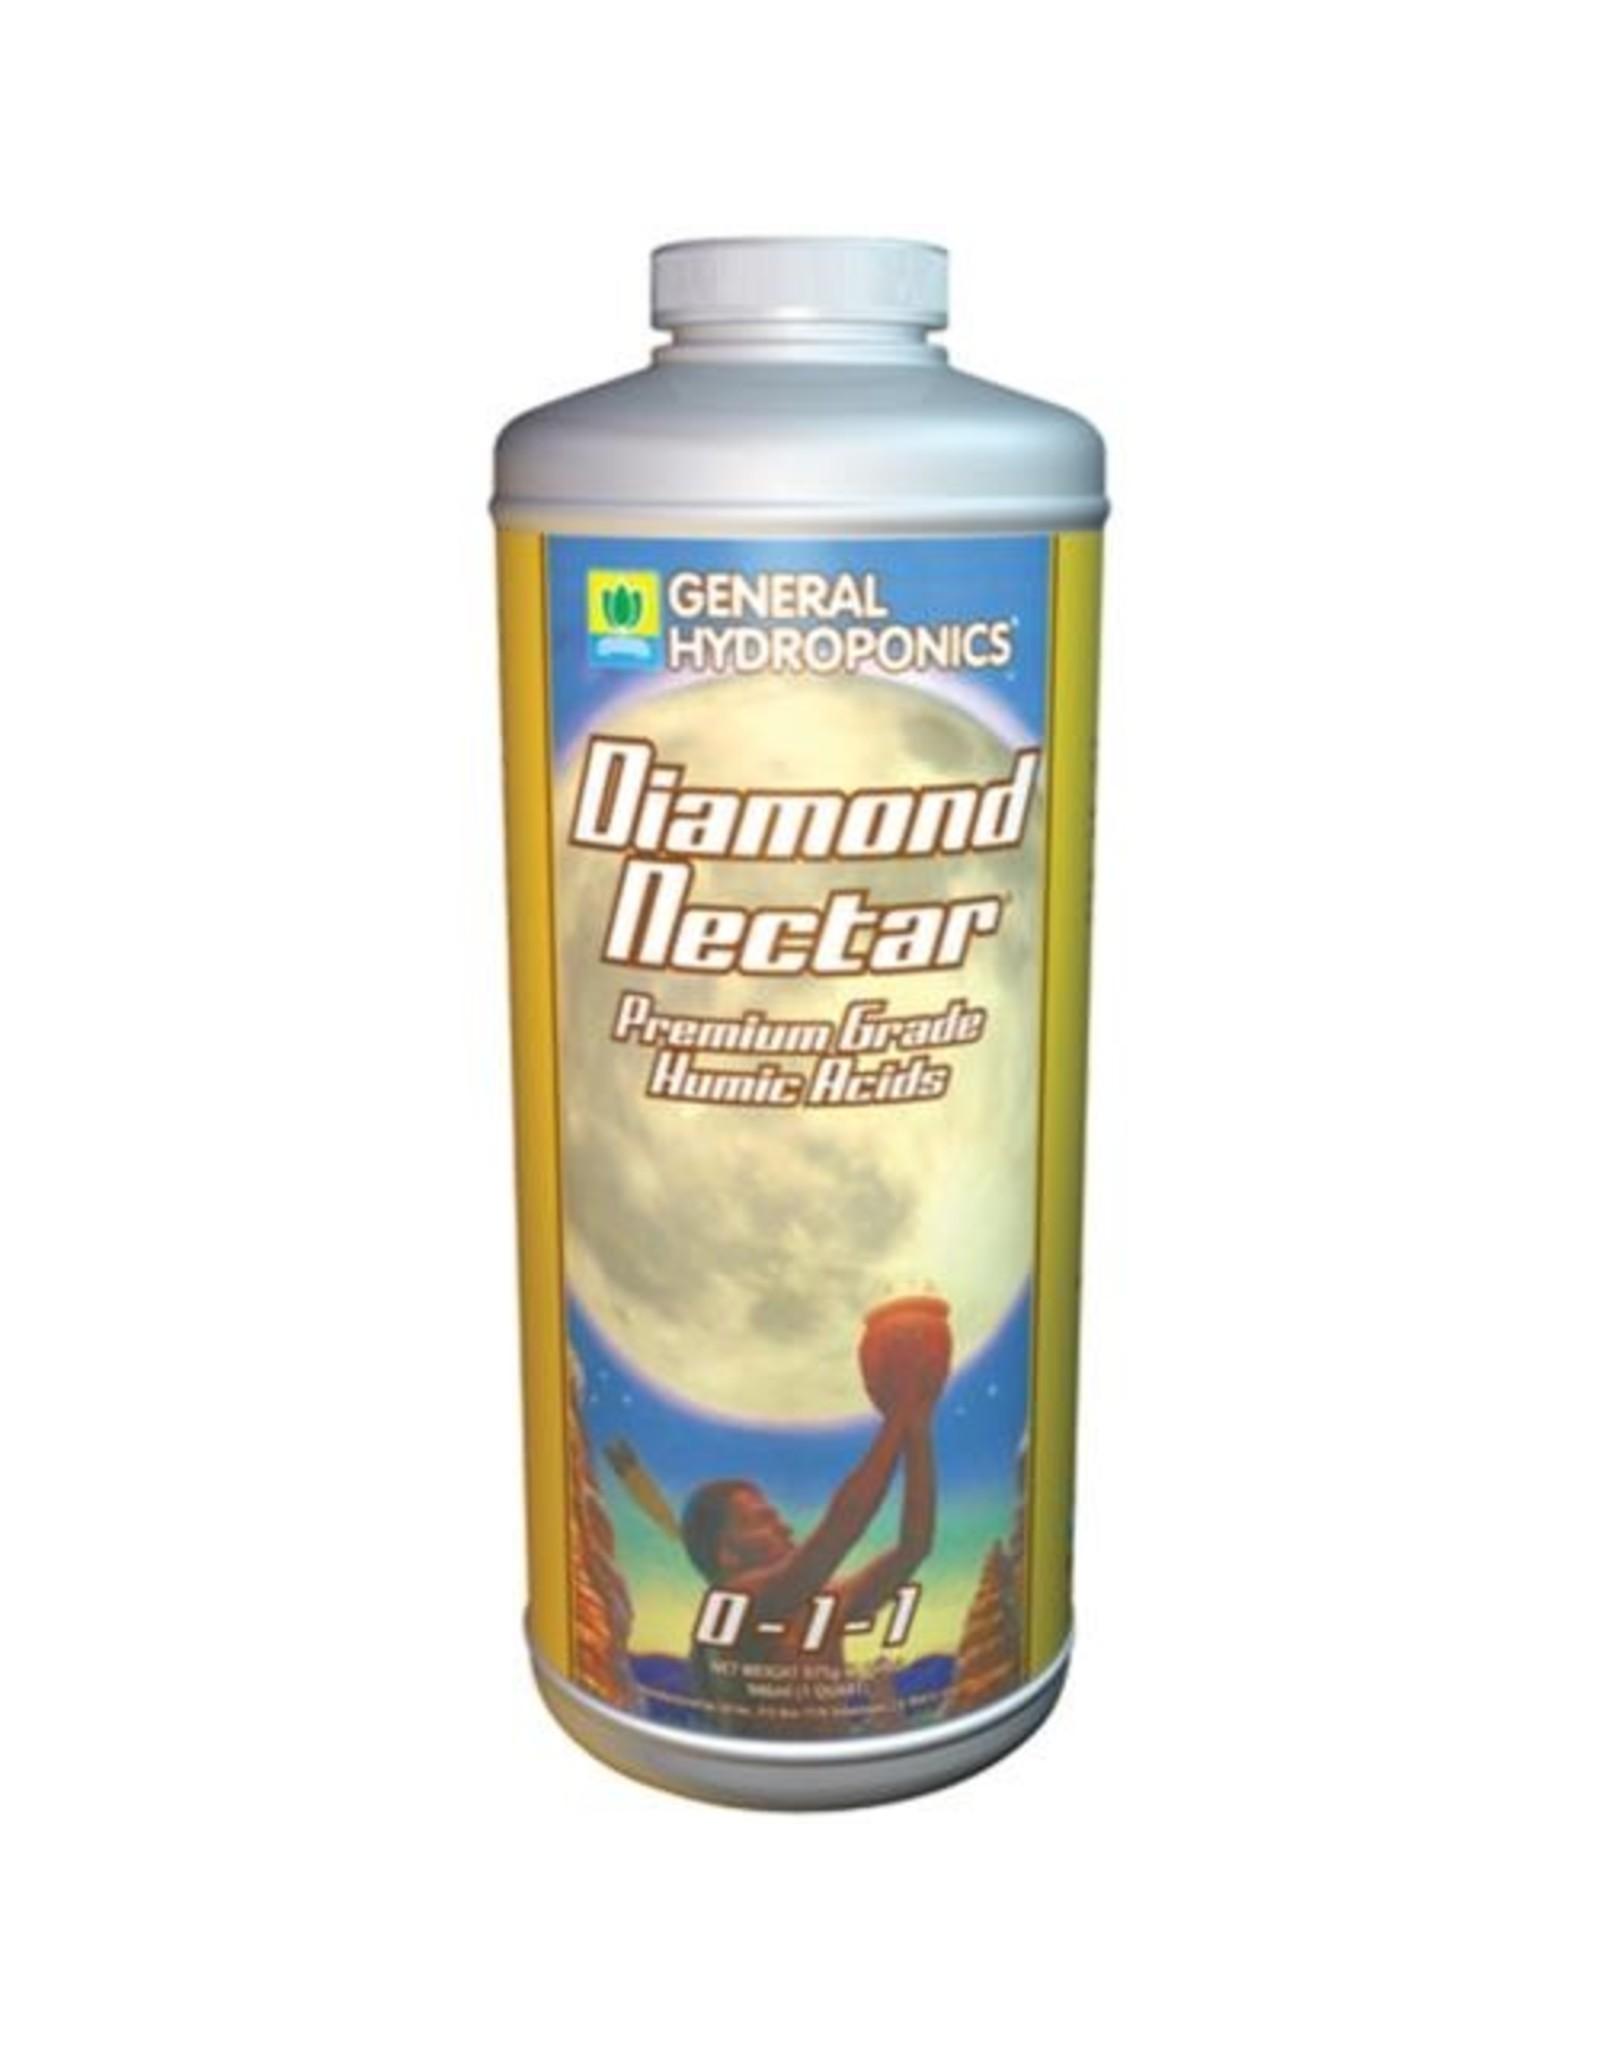 General Hydroponics GH Diamond Nectar - qt